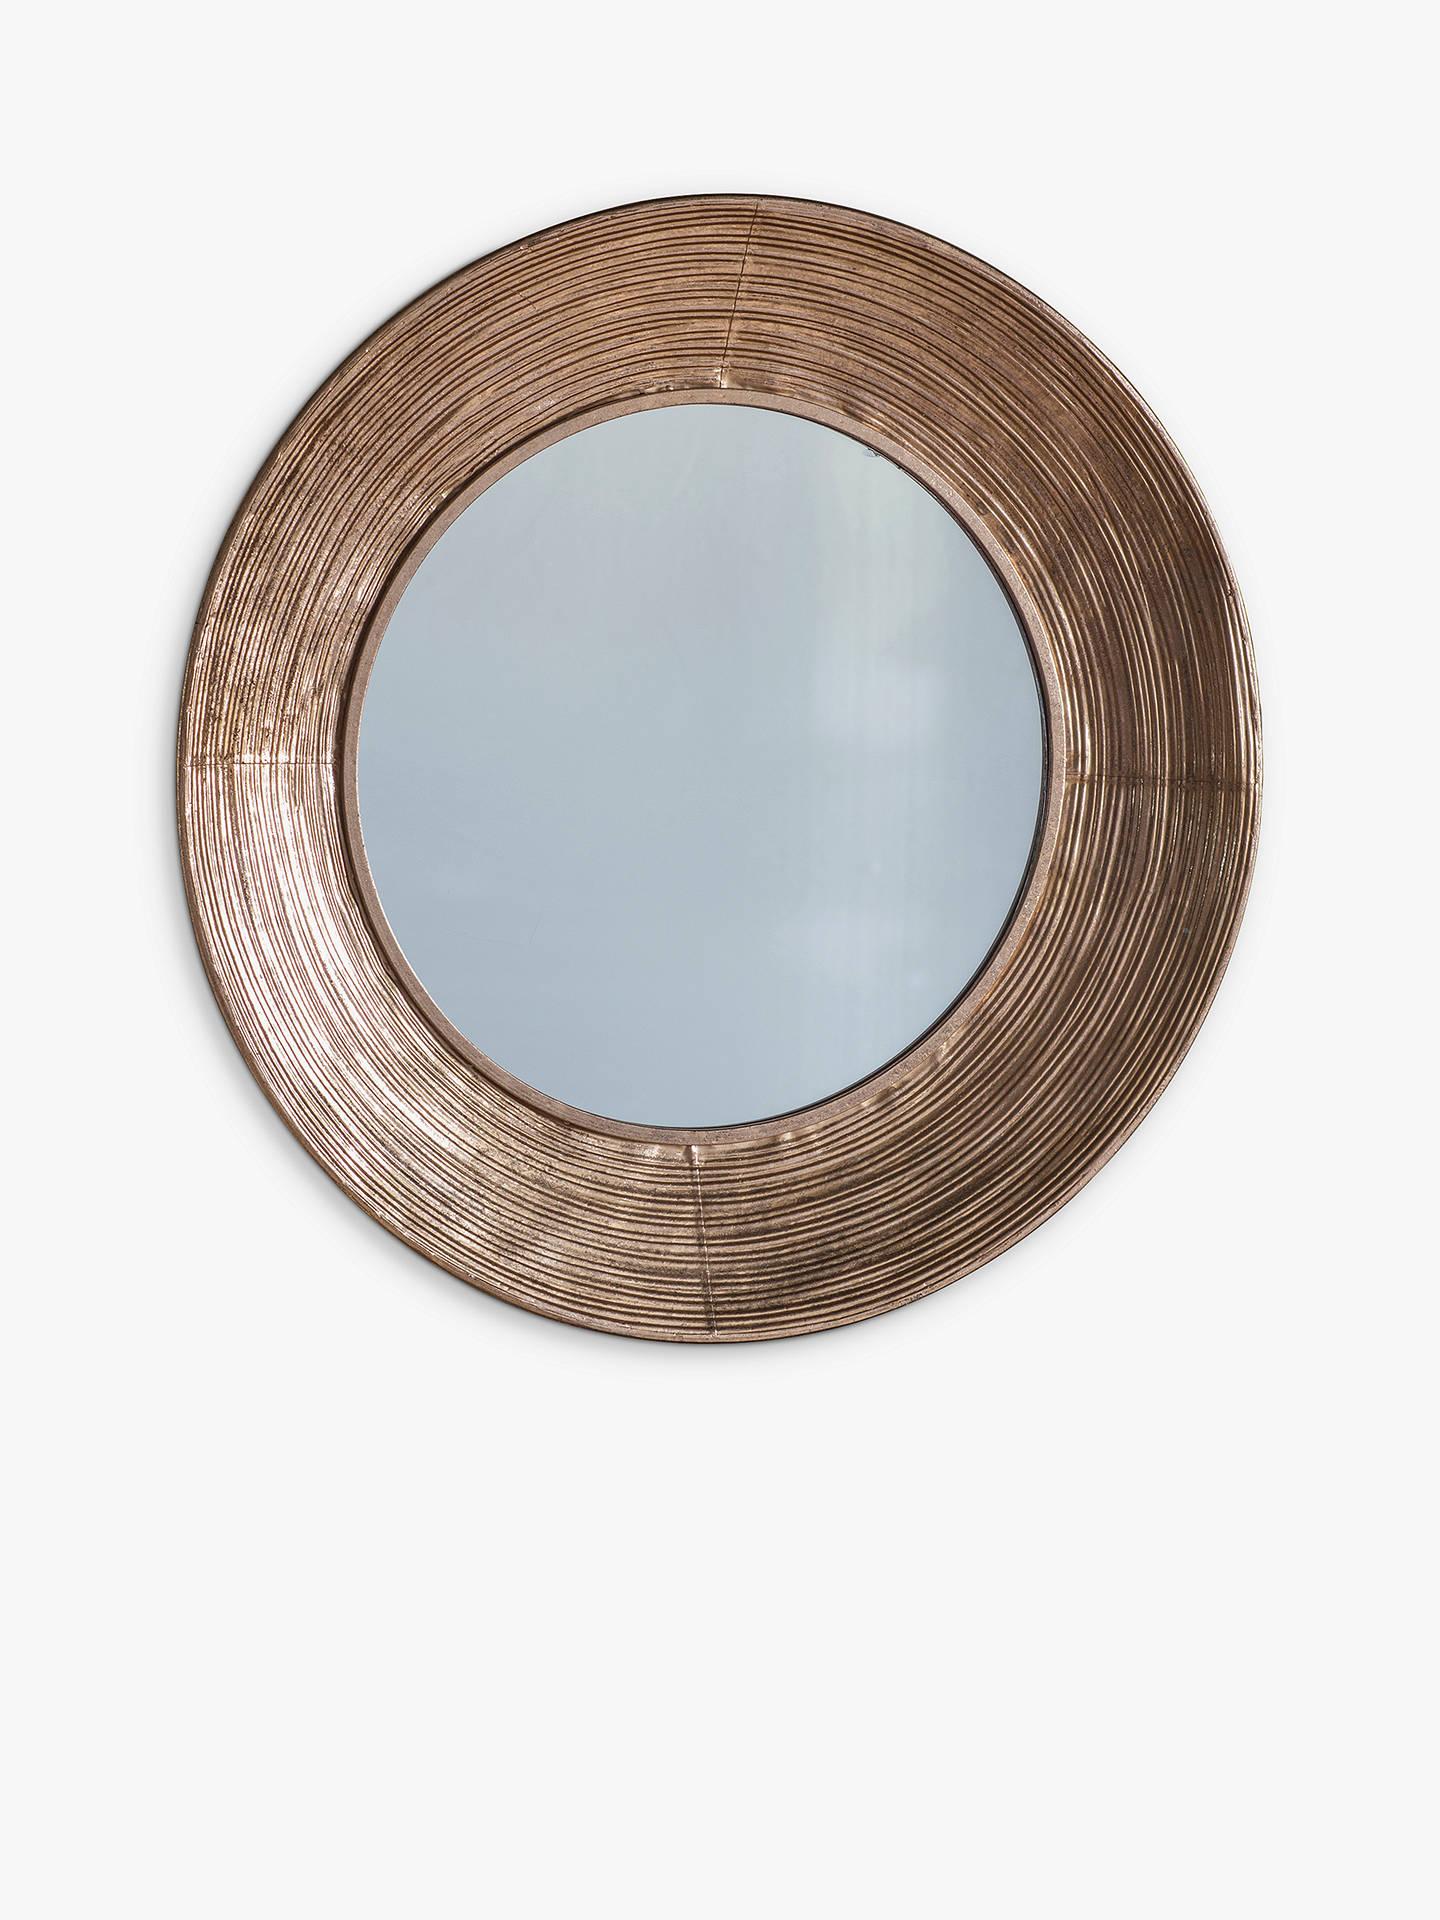 Knowle Round Metal Frame Mirror 72cm Gold At John Lewis Partners